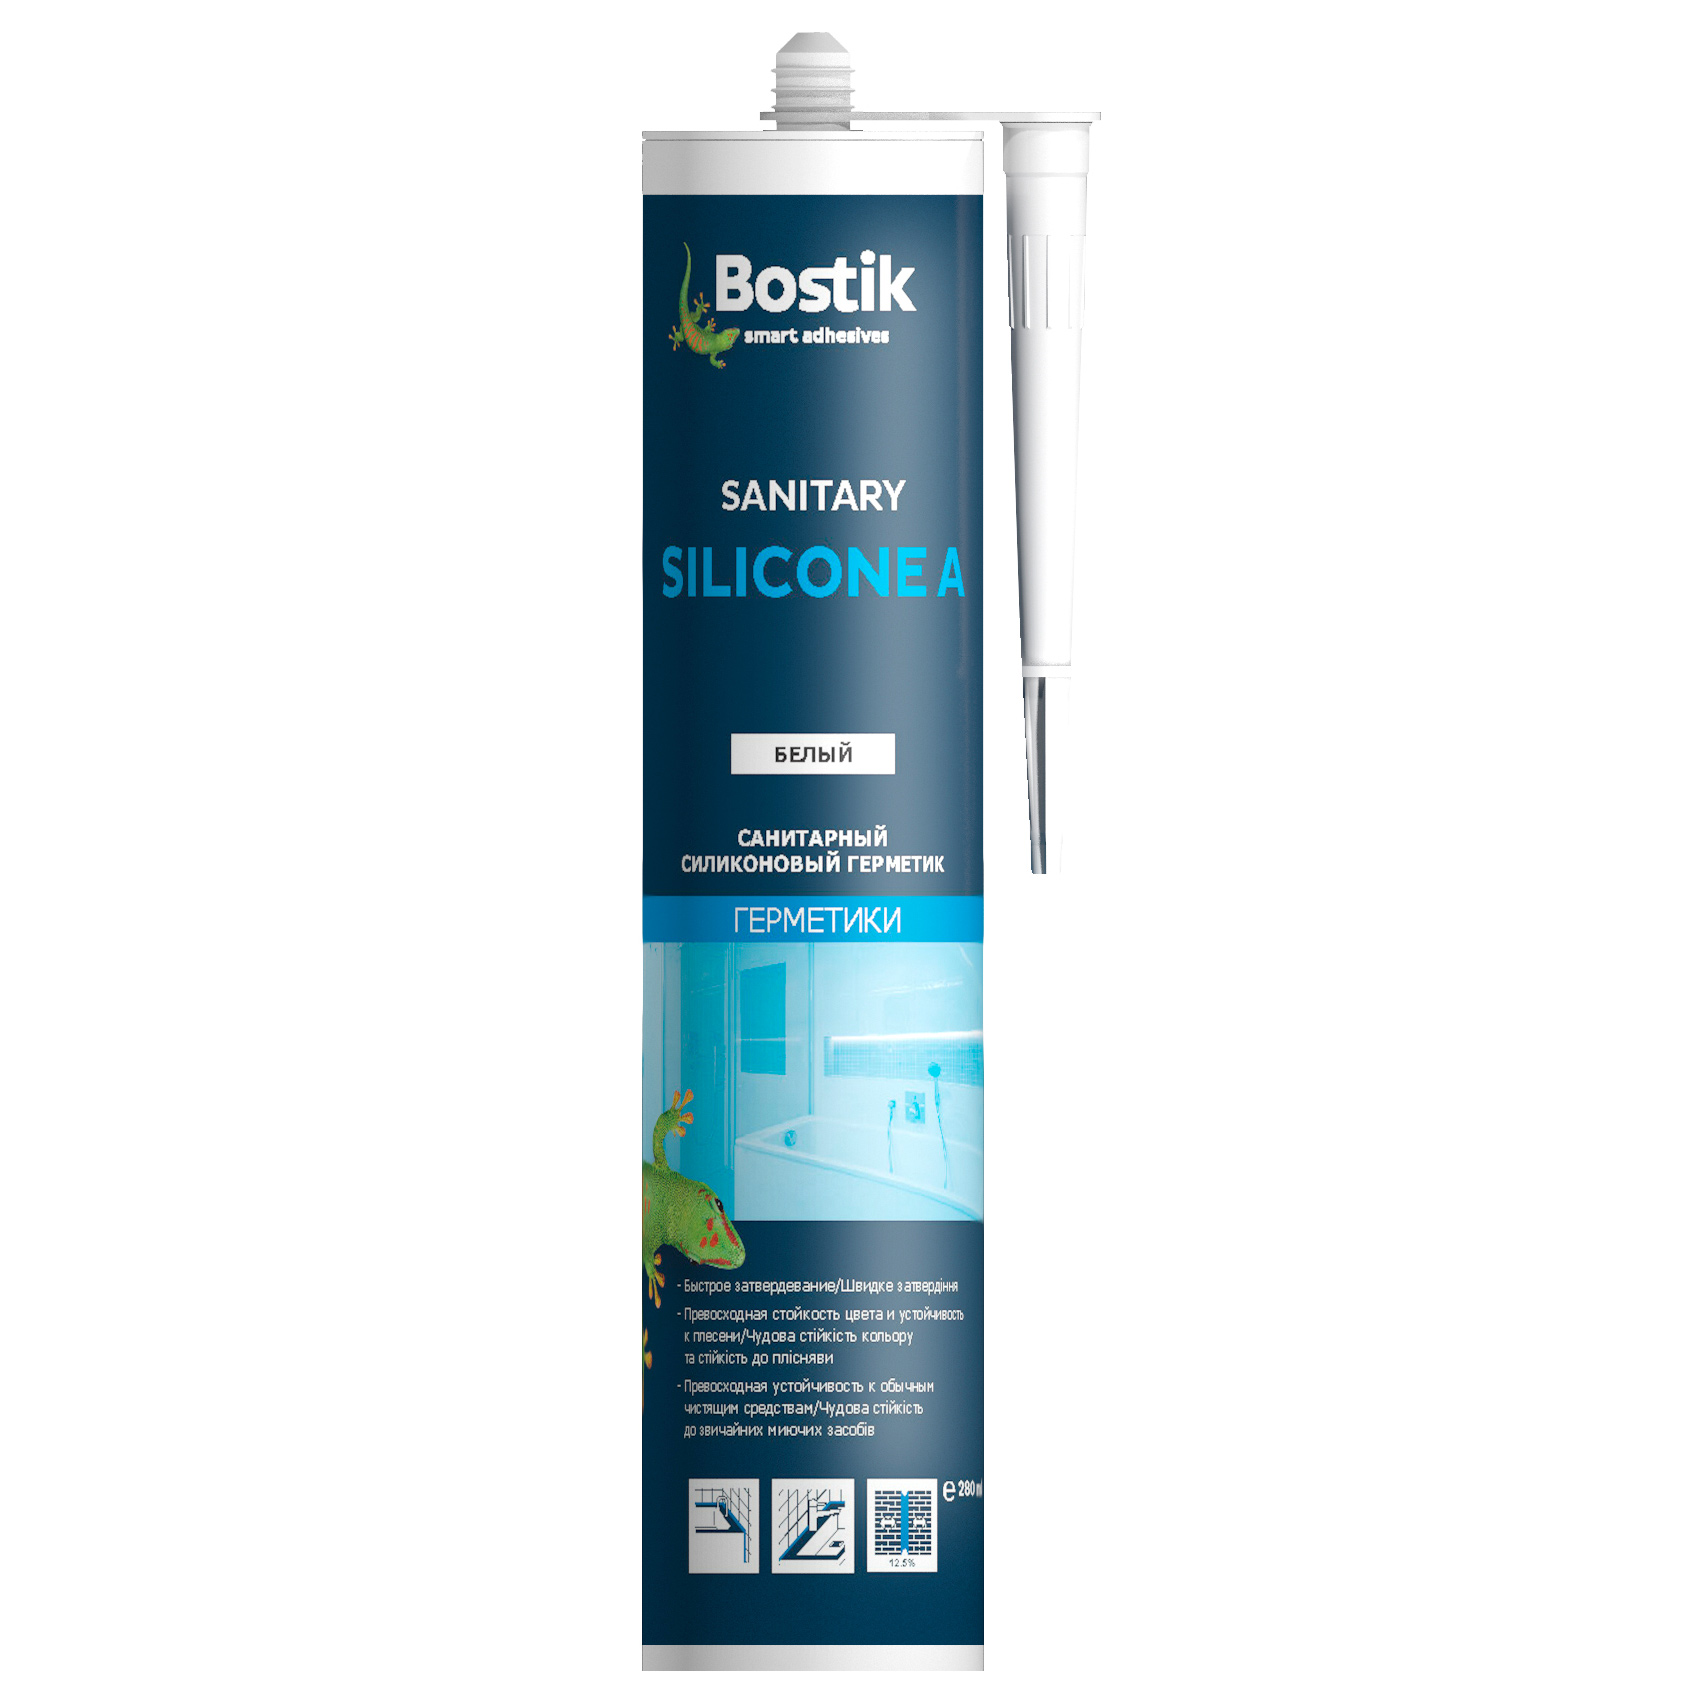 Герметик Bostik Sanitary Silicone A белый 280 мл